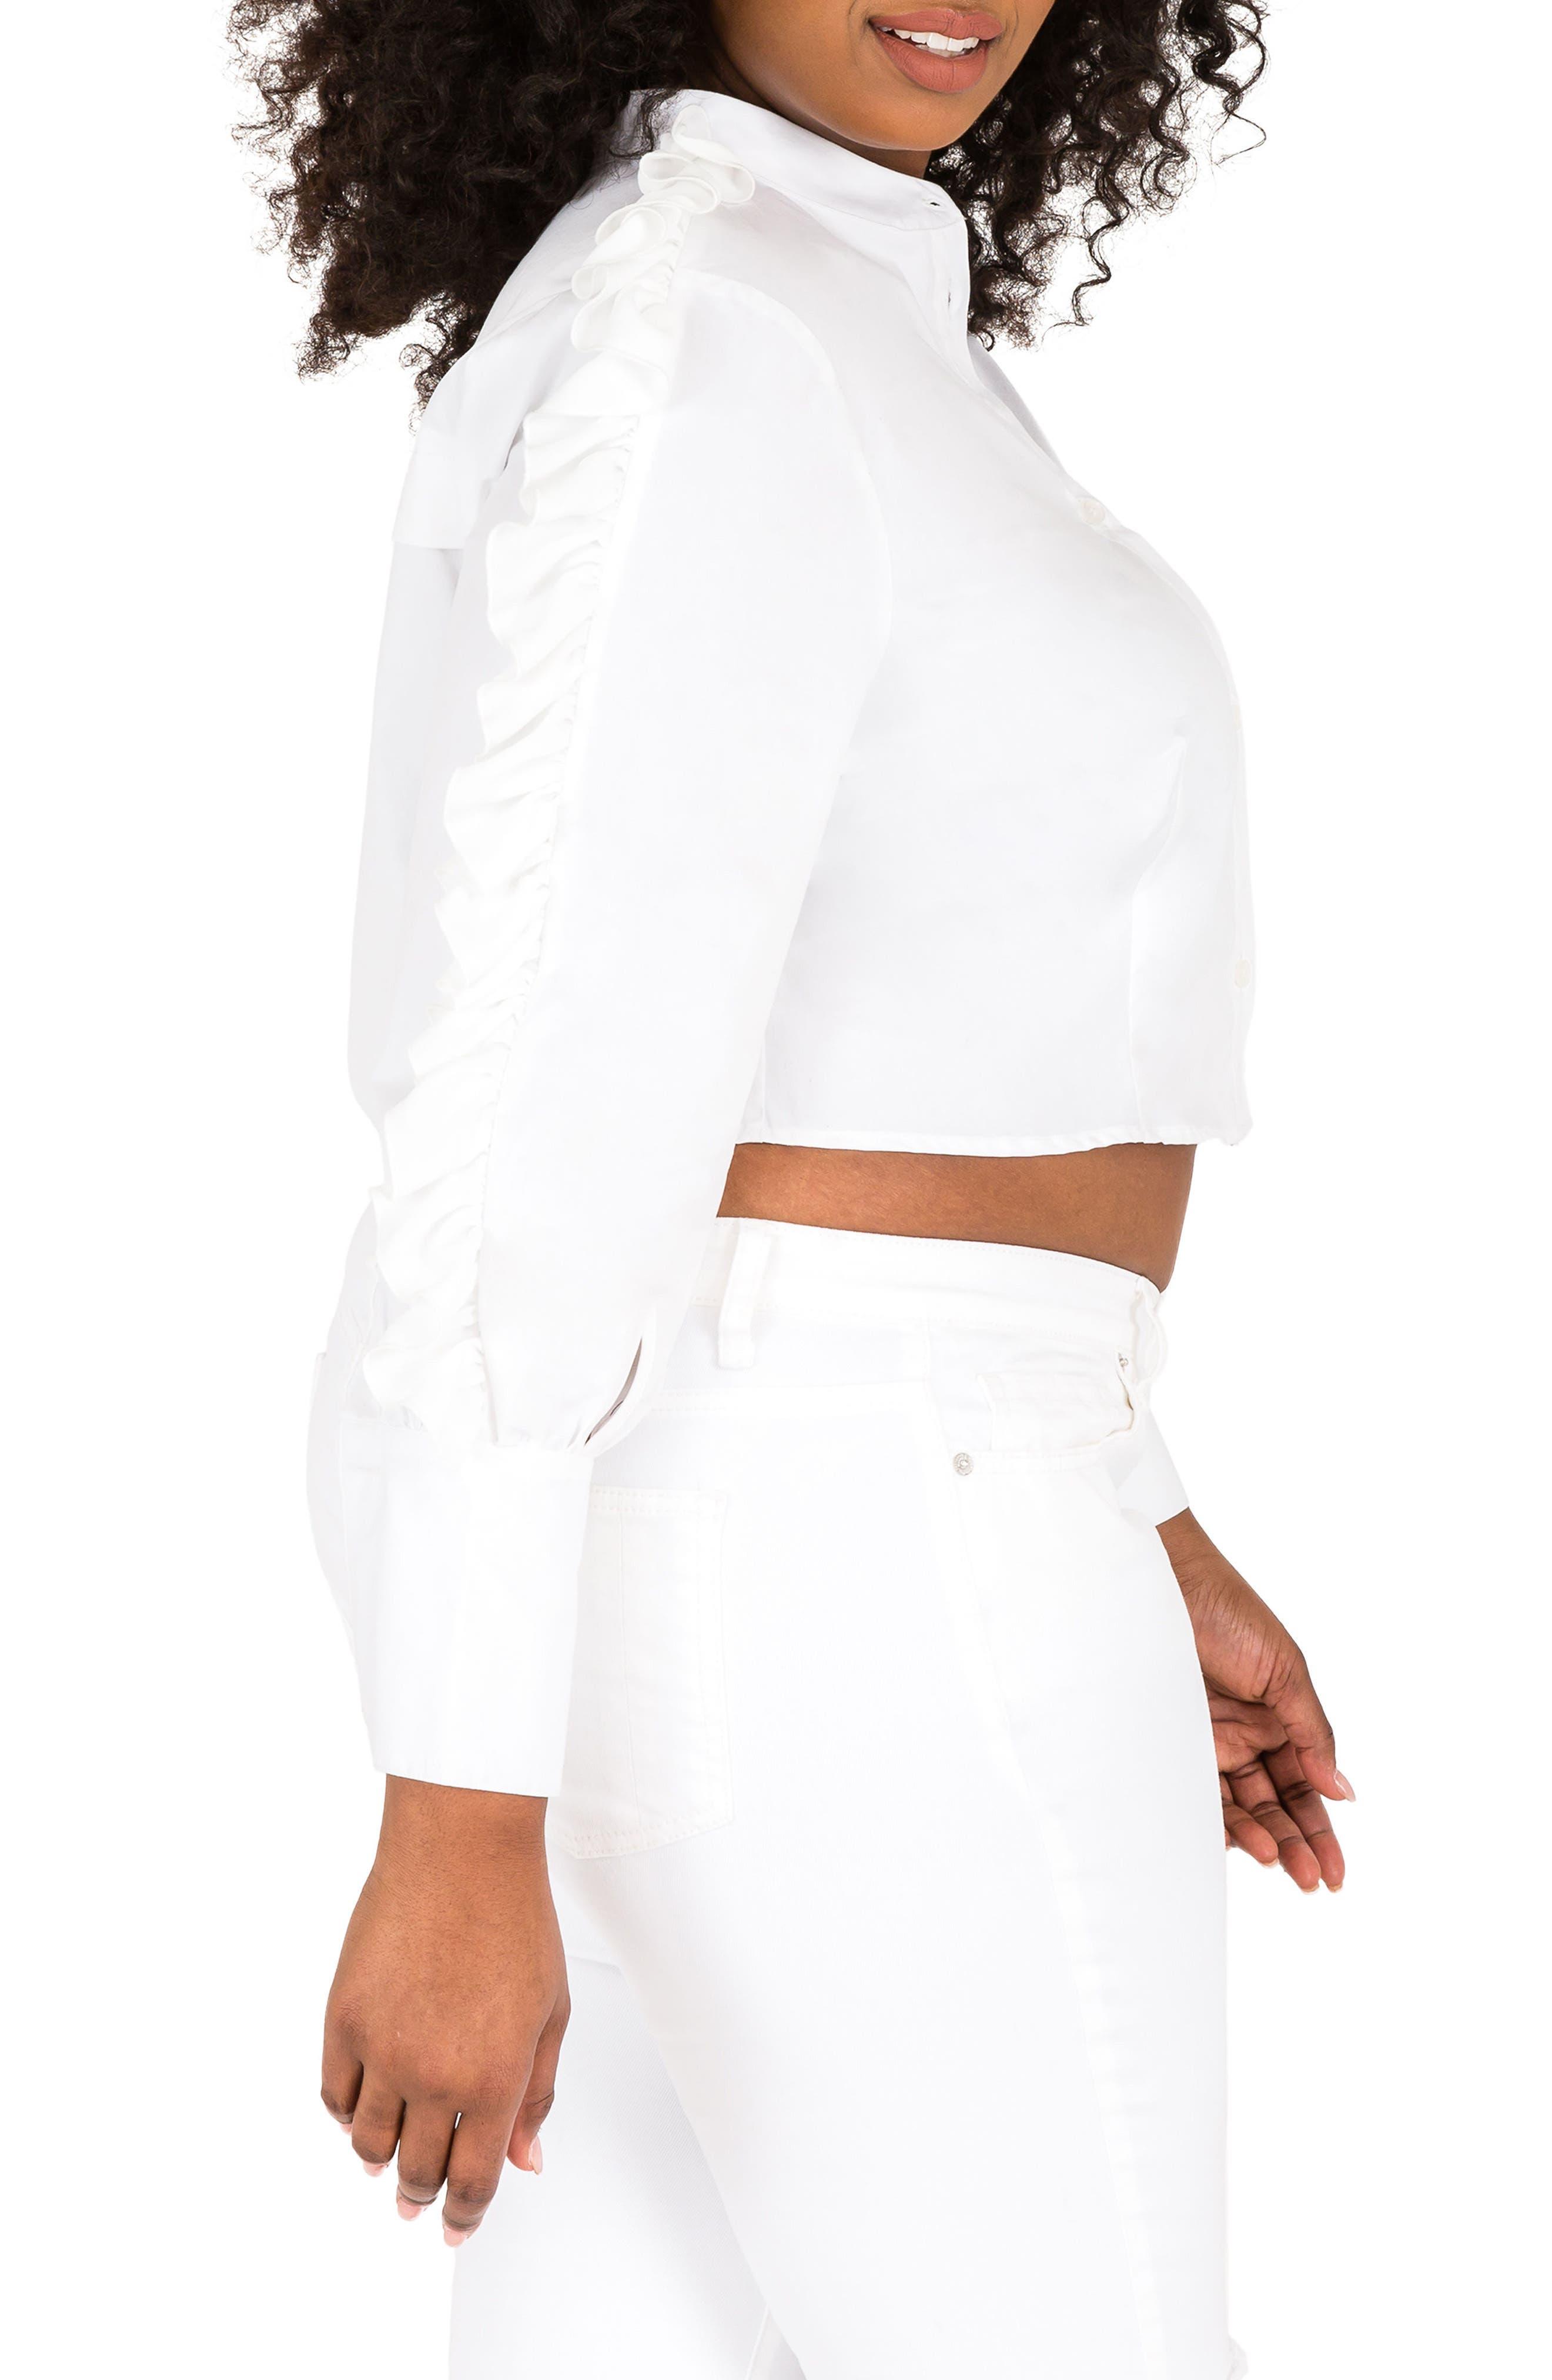 Mayasia Ruffle Sleeve Crop Shirt,                             Alternate thumbnail 4, color,                             White